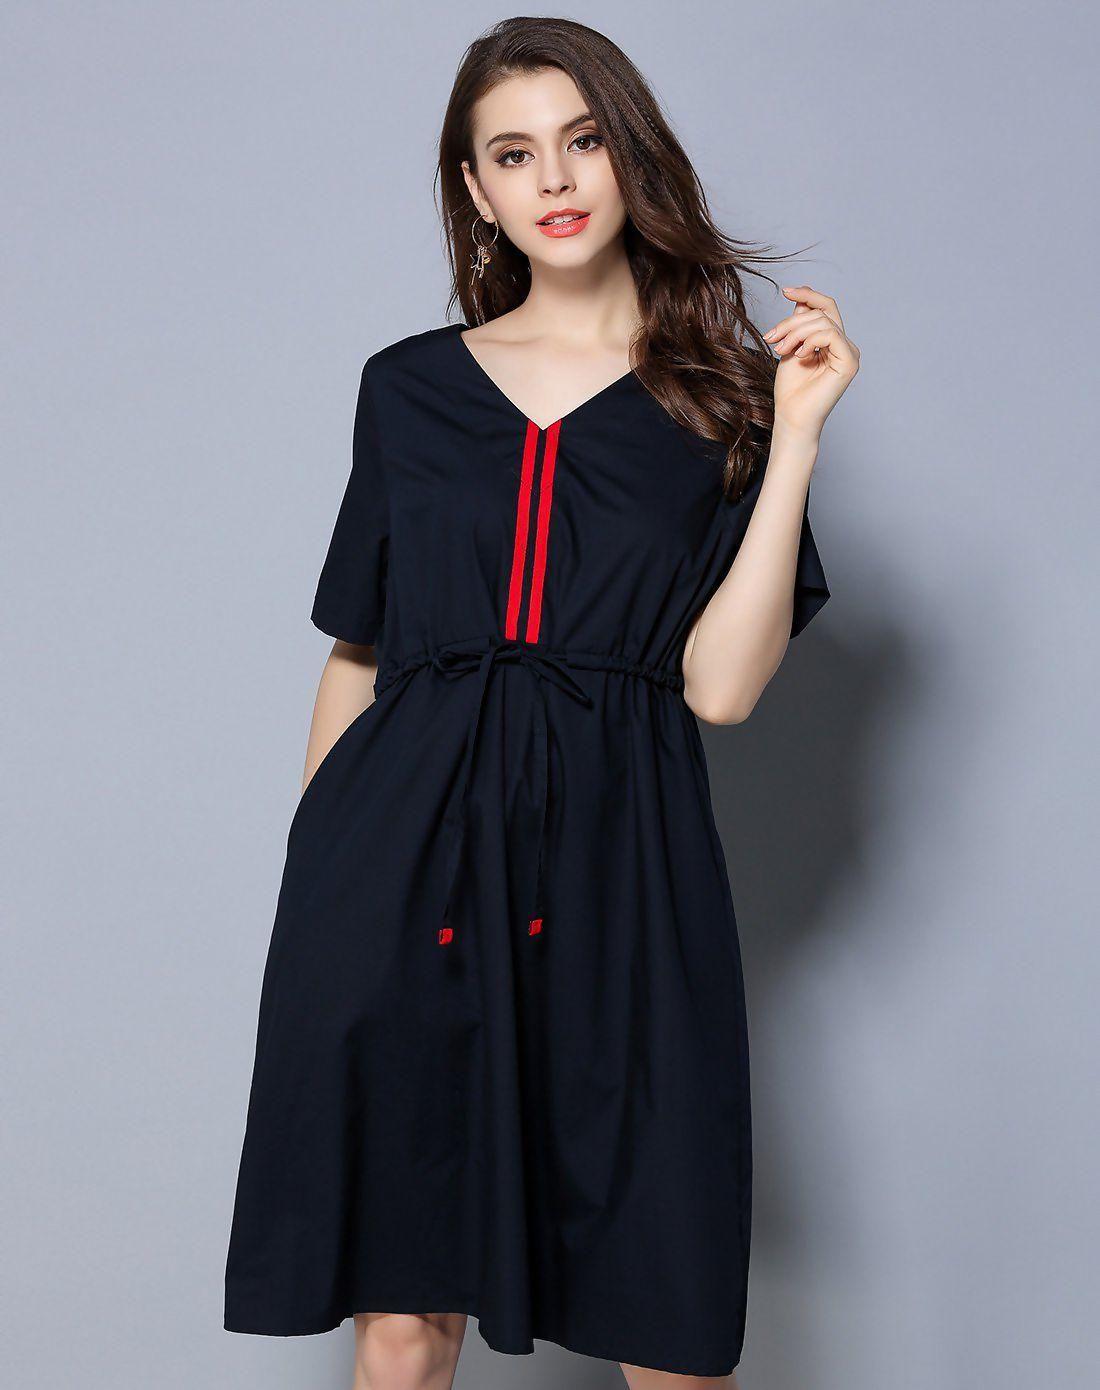 #AdoreWe #VIPshop Womens - LETDIOSTO Cyan School Paneled Cotton Summer  Pleated Plain V-Neck Dress - AdoreWe.com